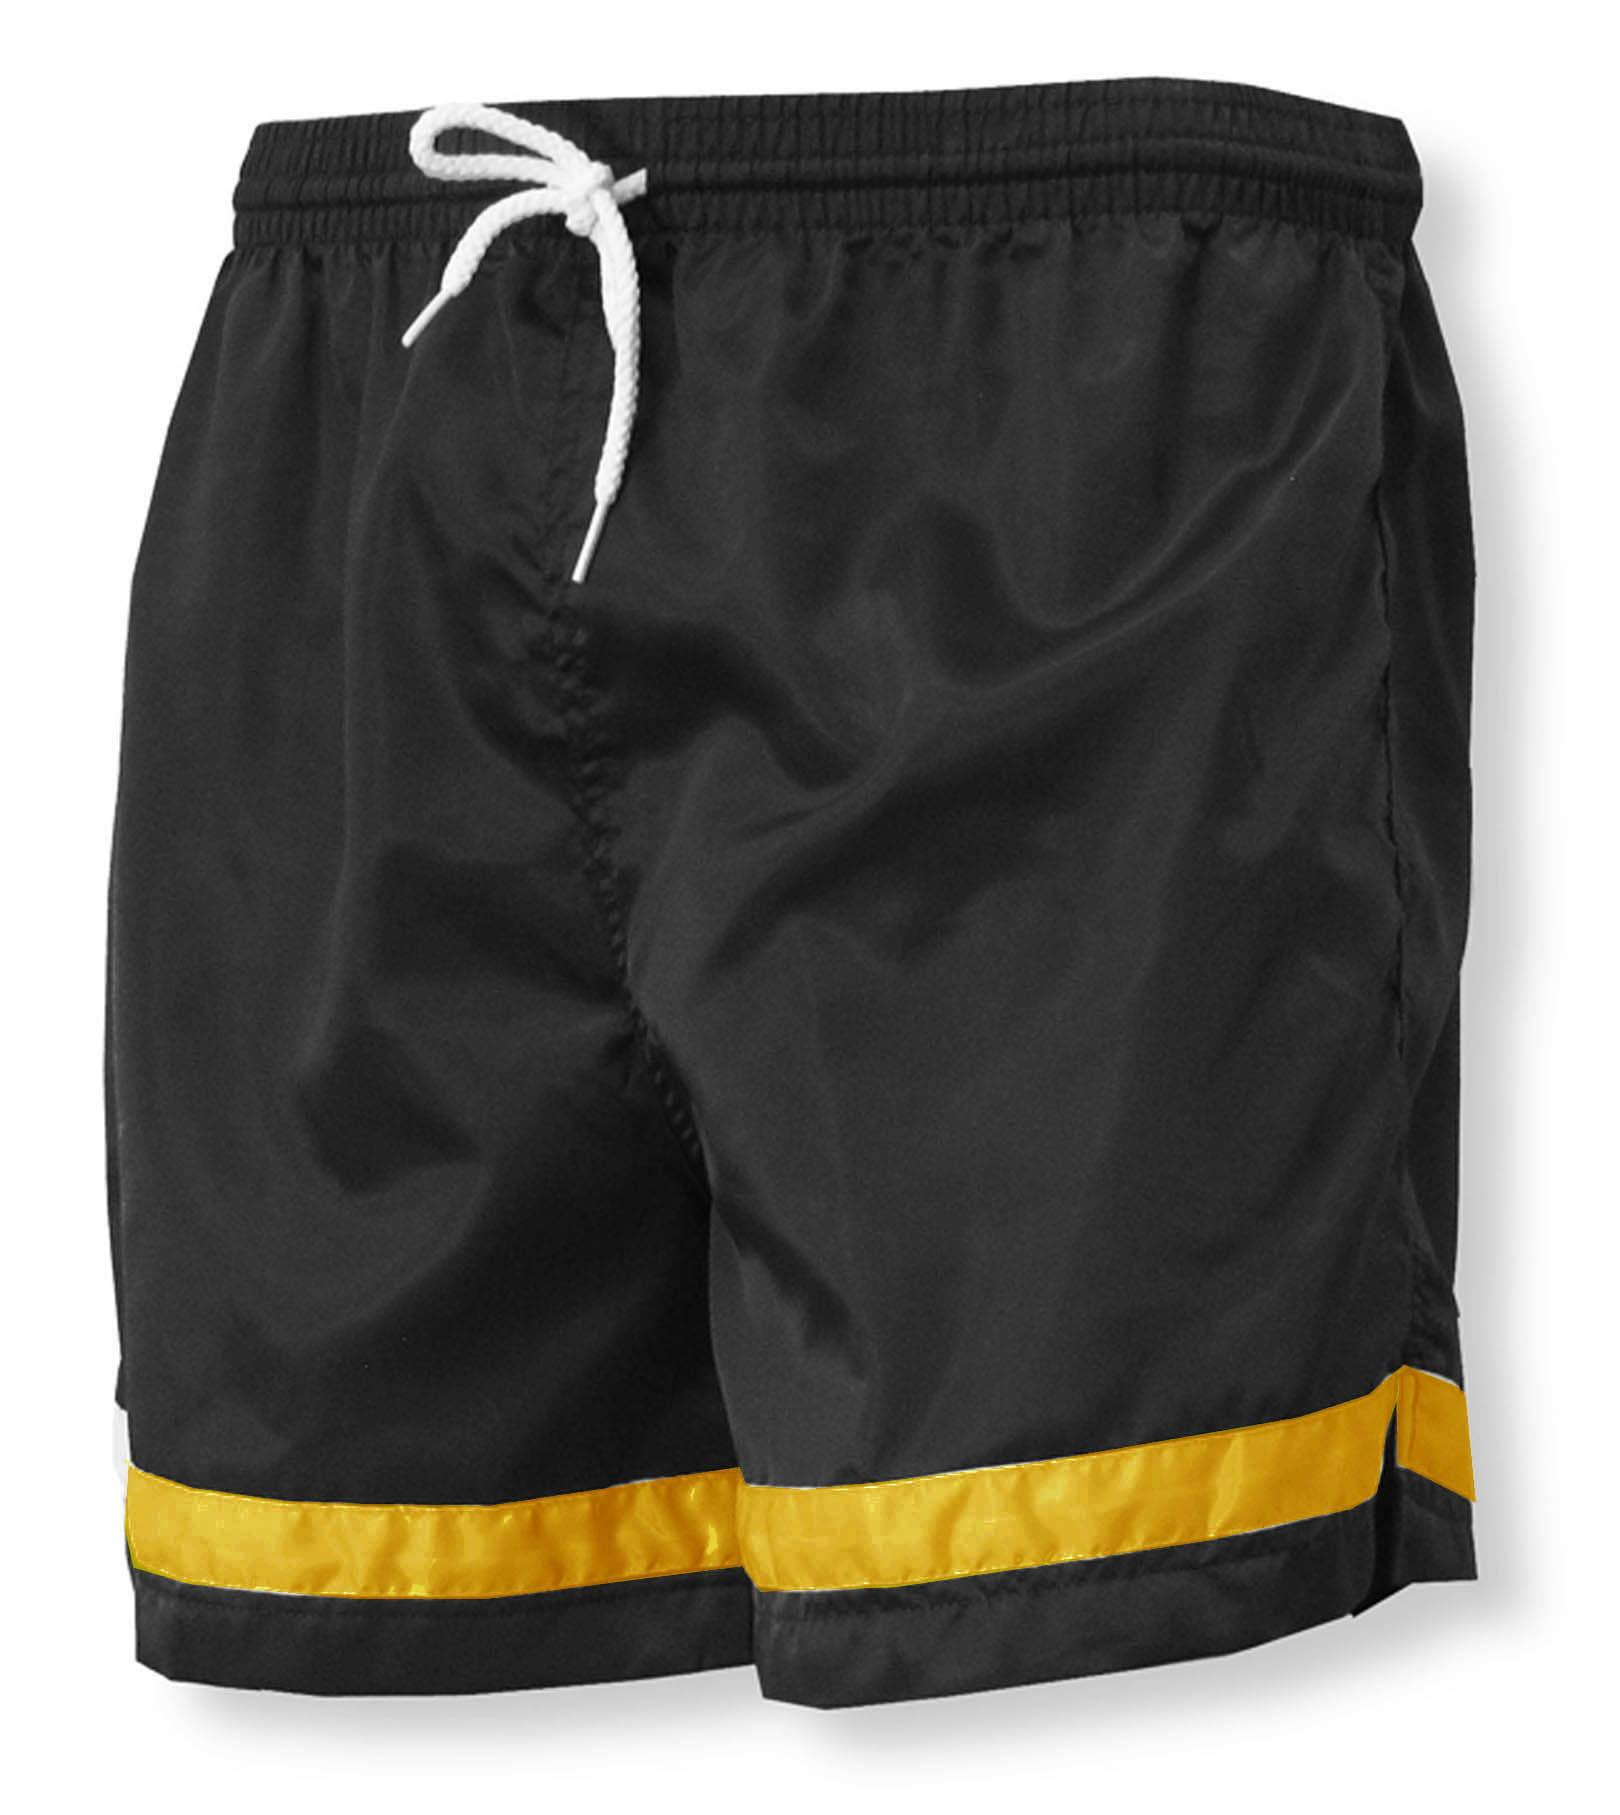 Vashon nylon team soccer shorts